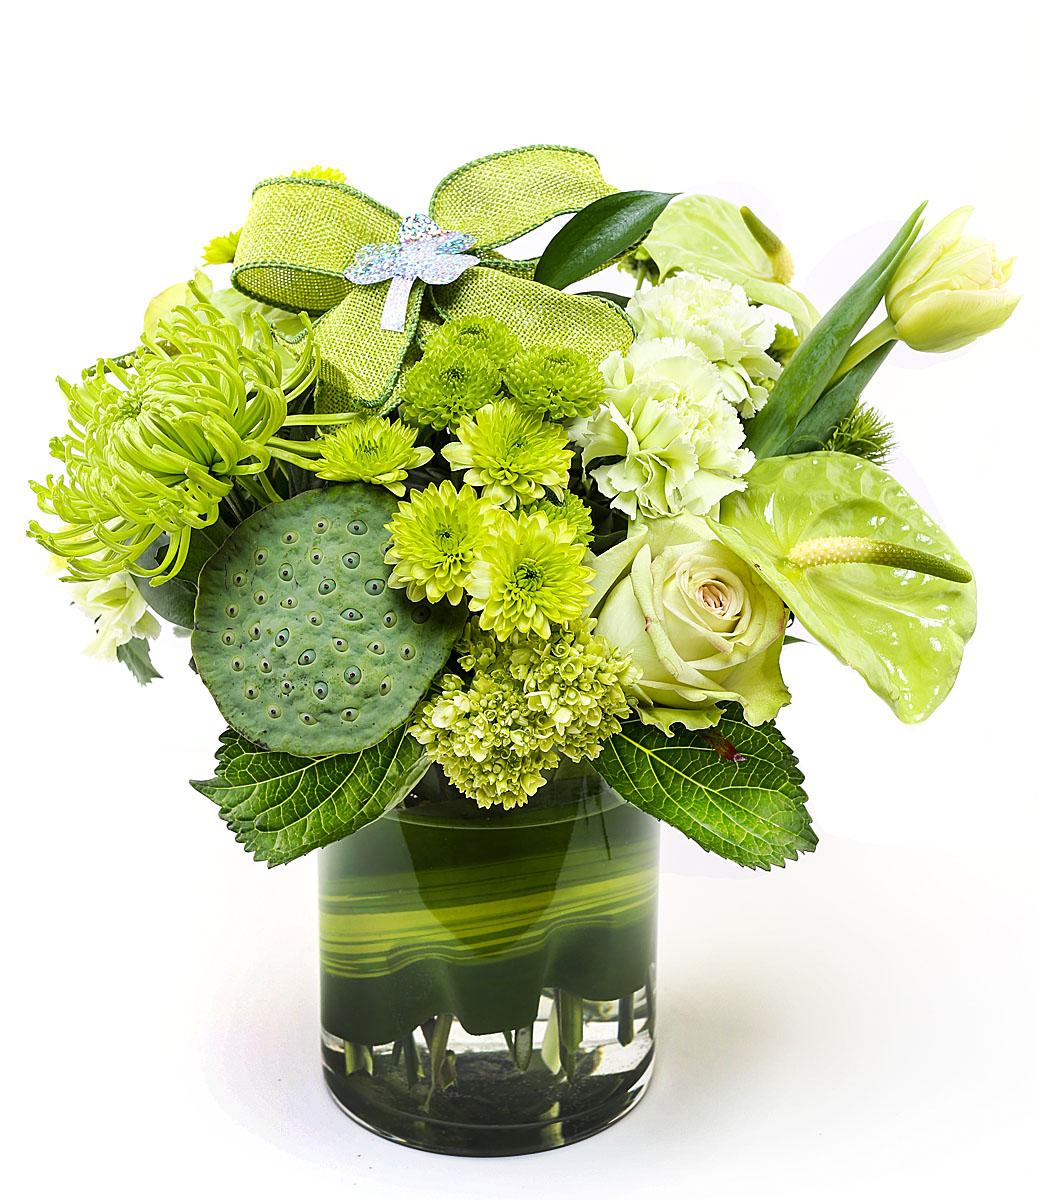 St. Patrick's Day Flower Arrangements Delivery